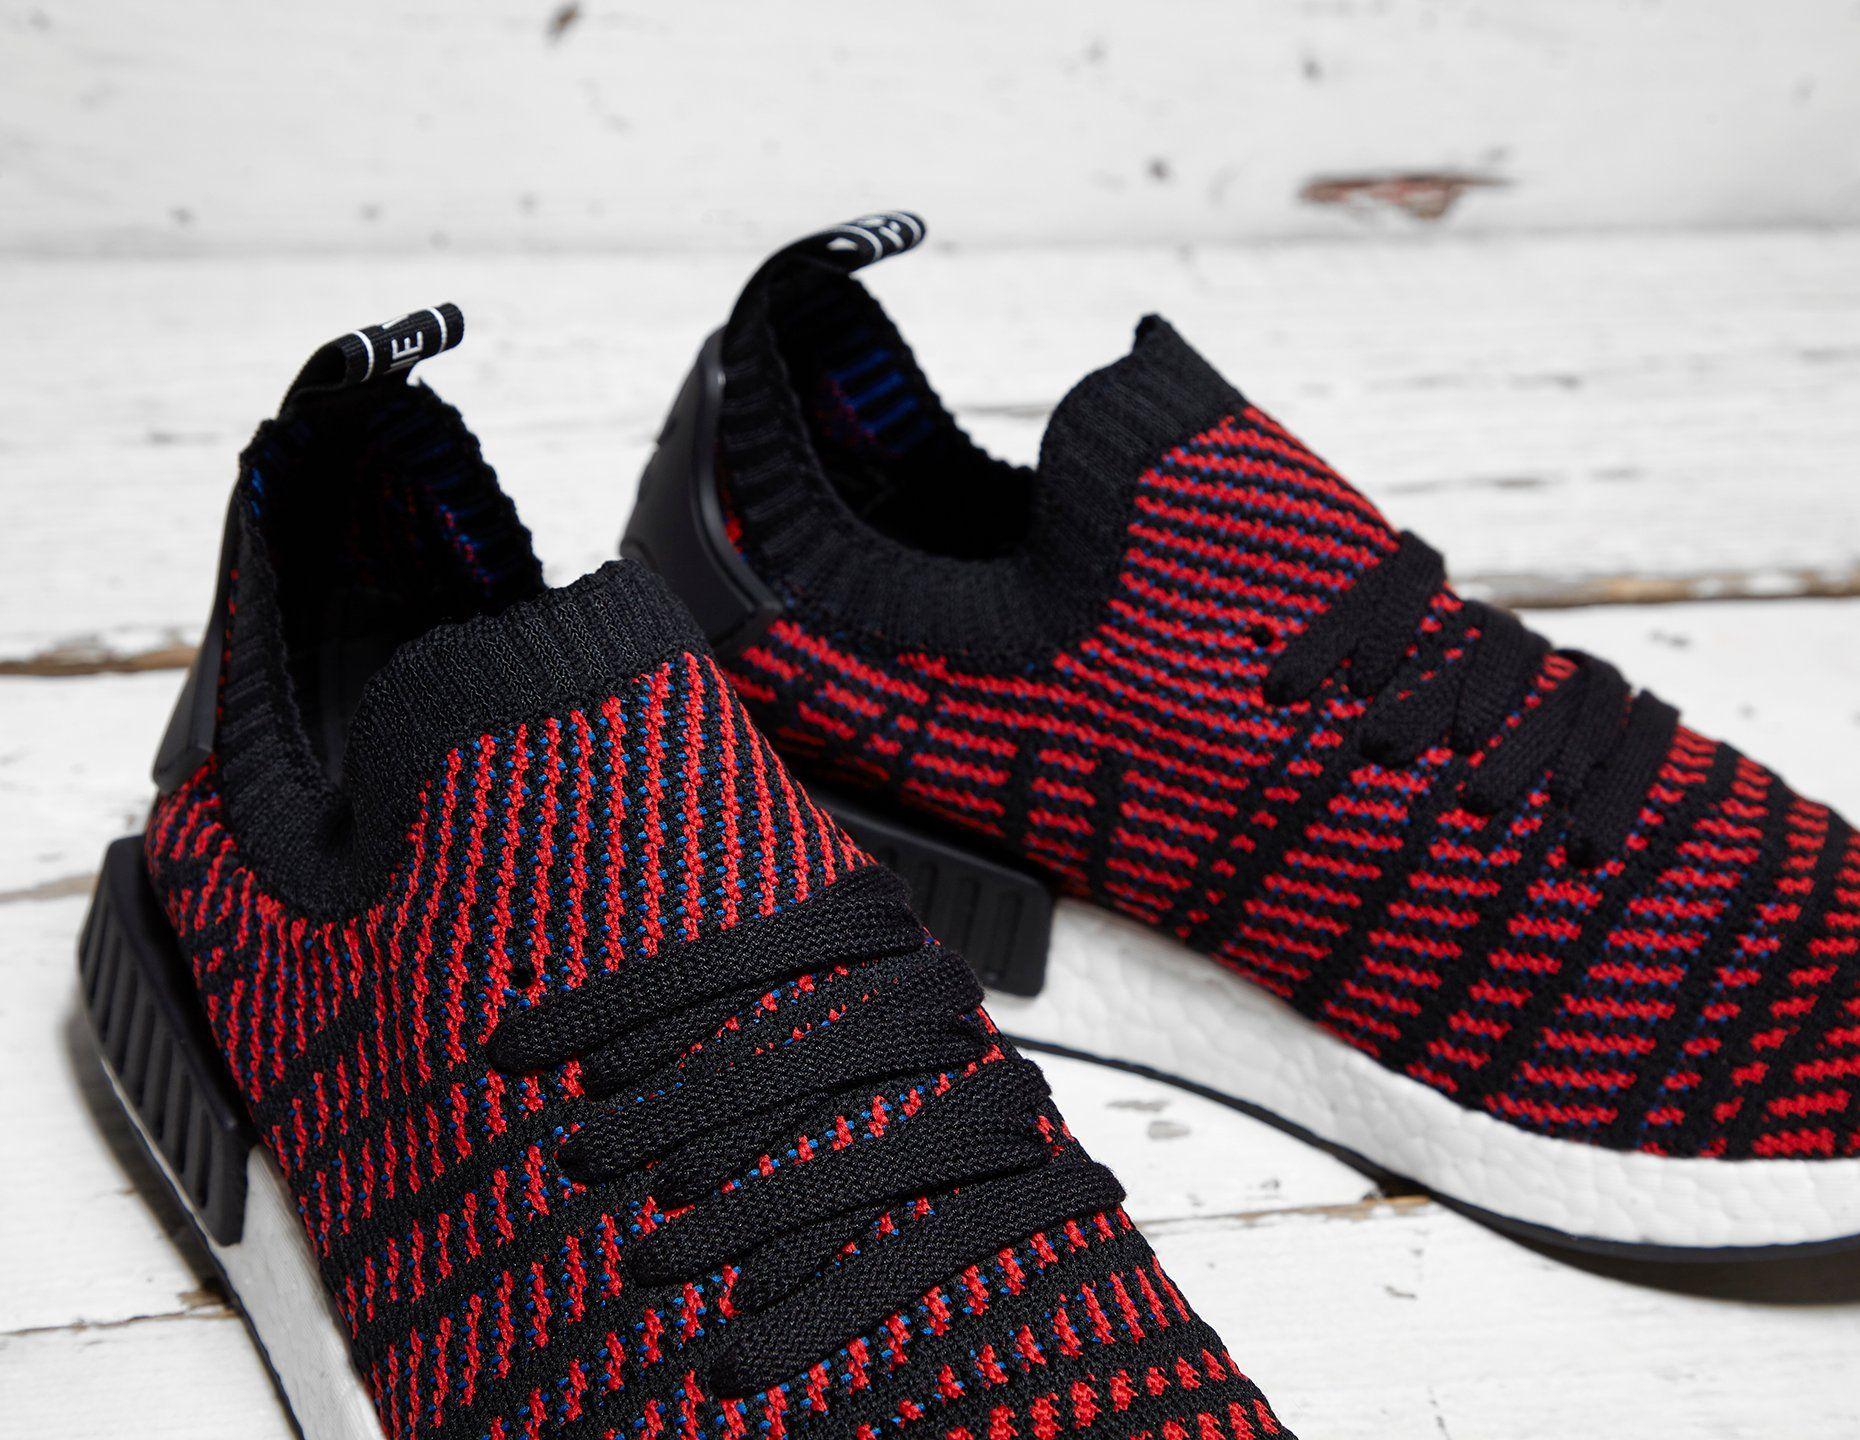 Adidas Originals Nmd R1 Stlt Footpatrol